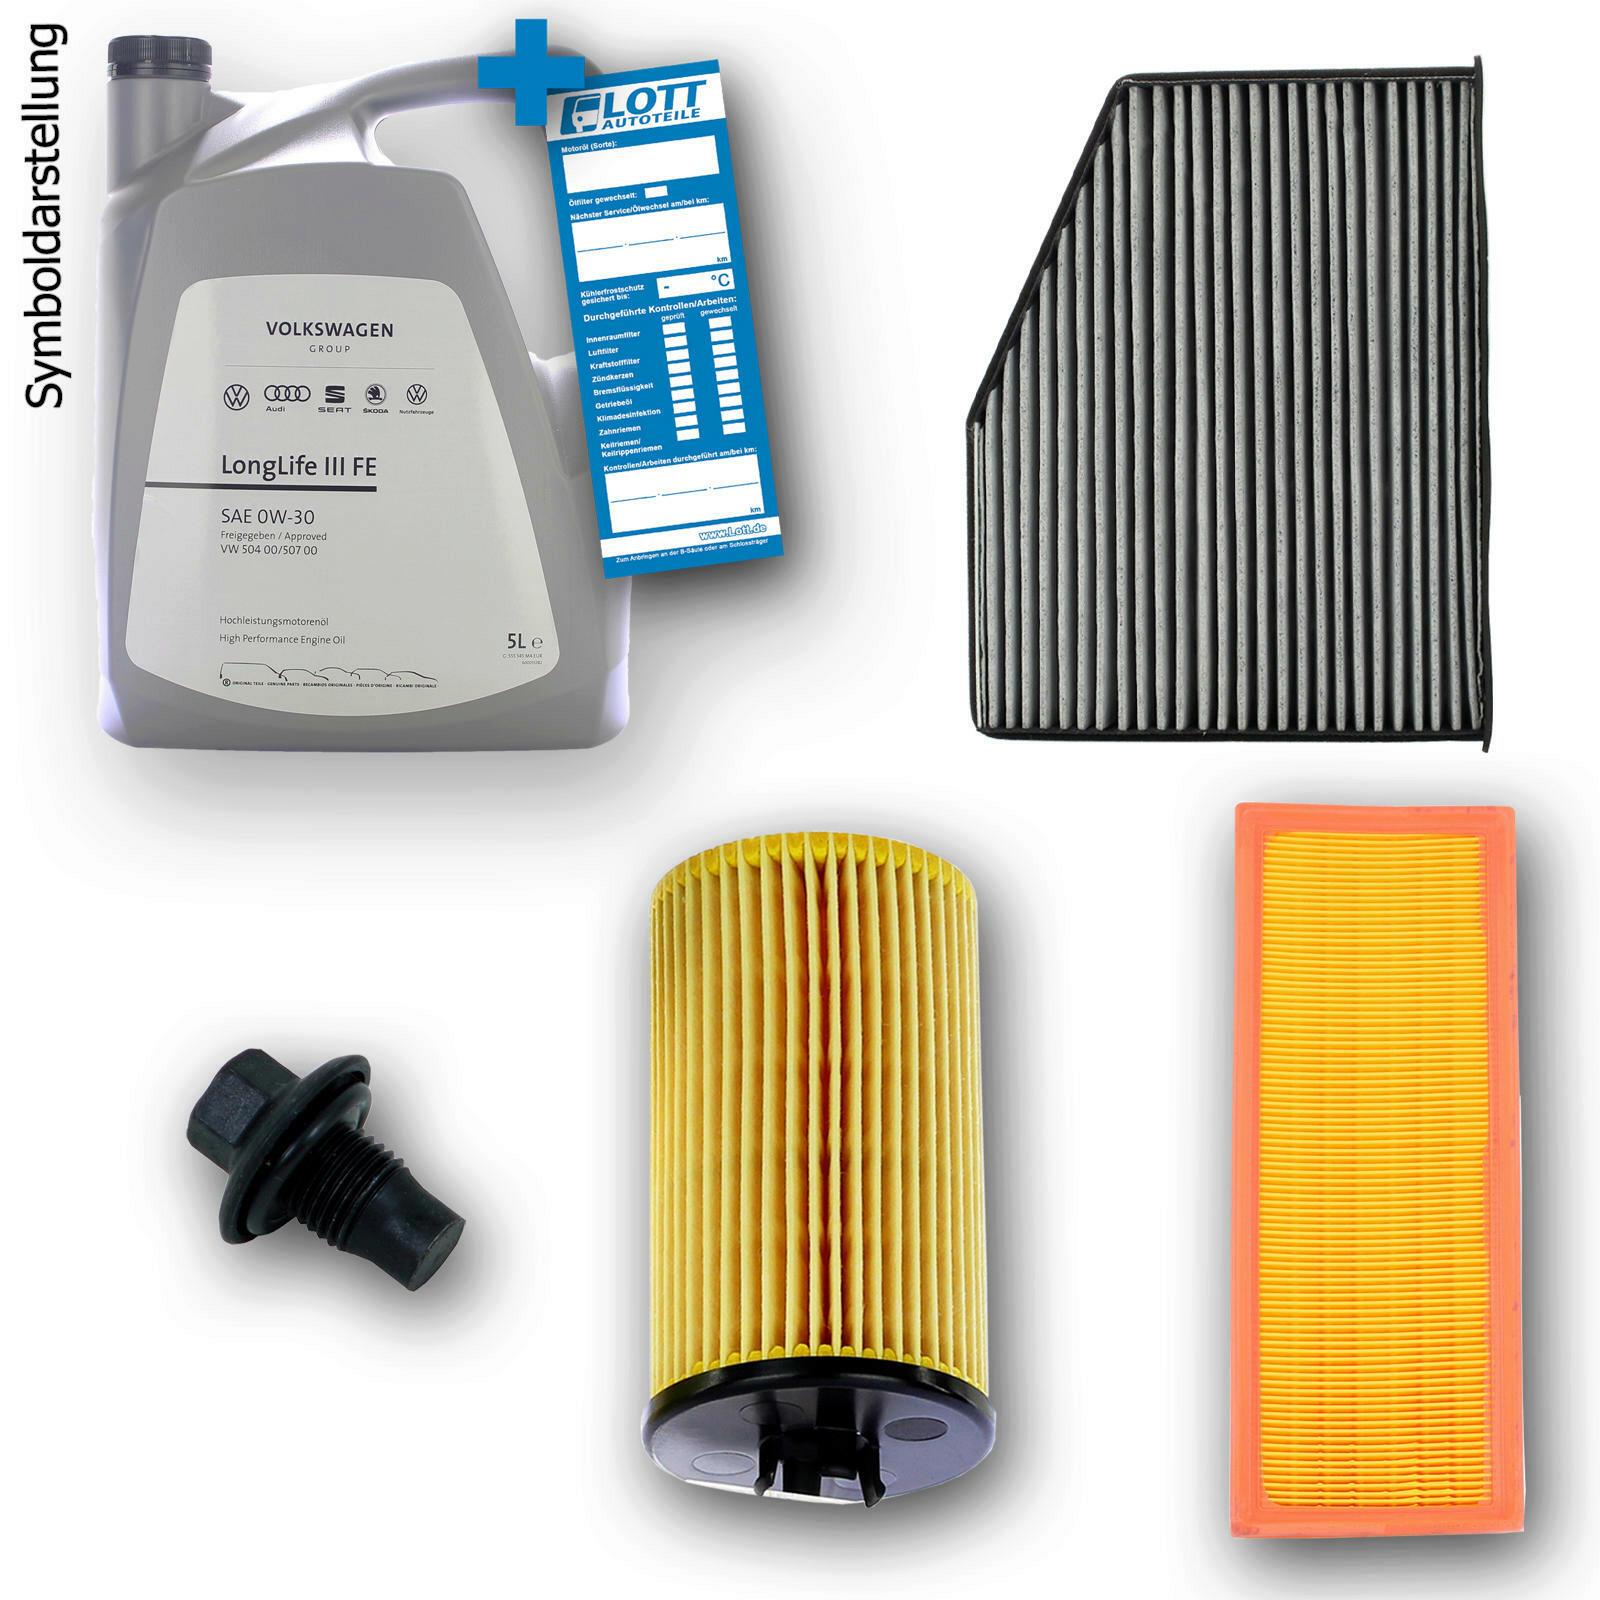 VW Motoröl + Ölfilter + Luftfilter + Innenraumfilter + Ablassschraube